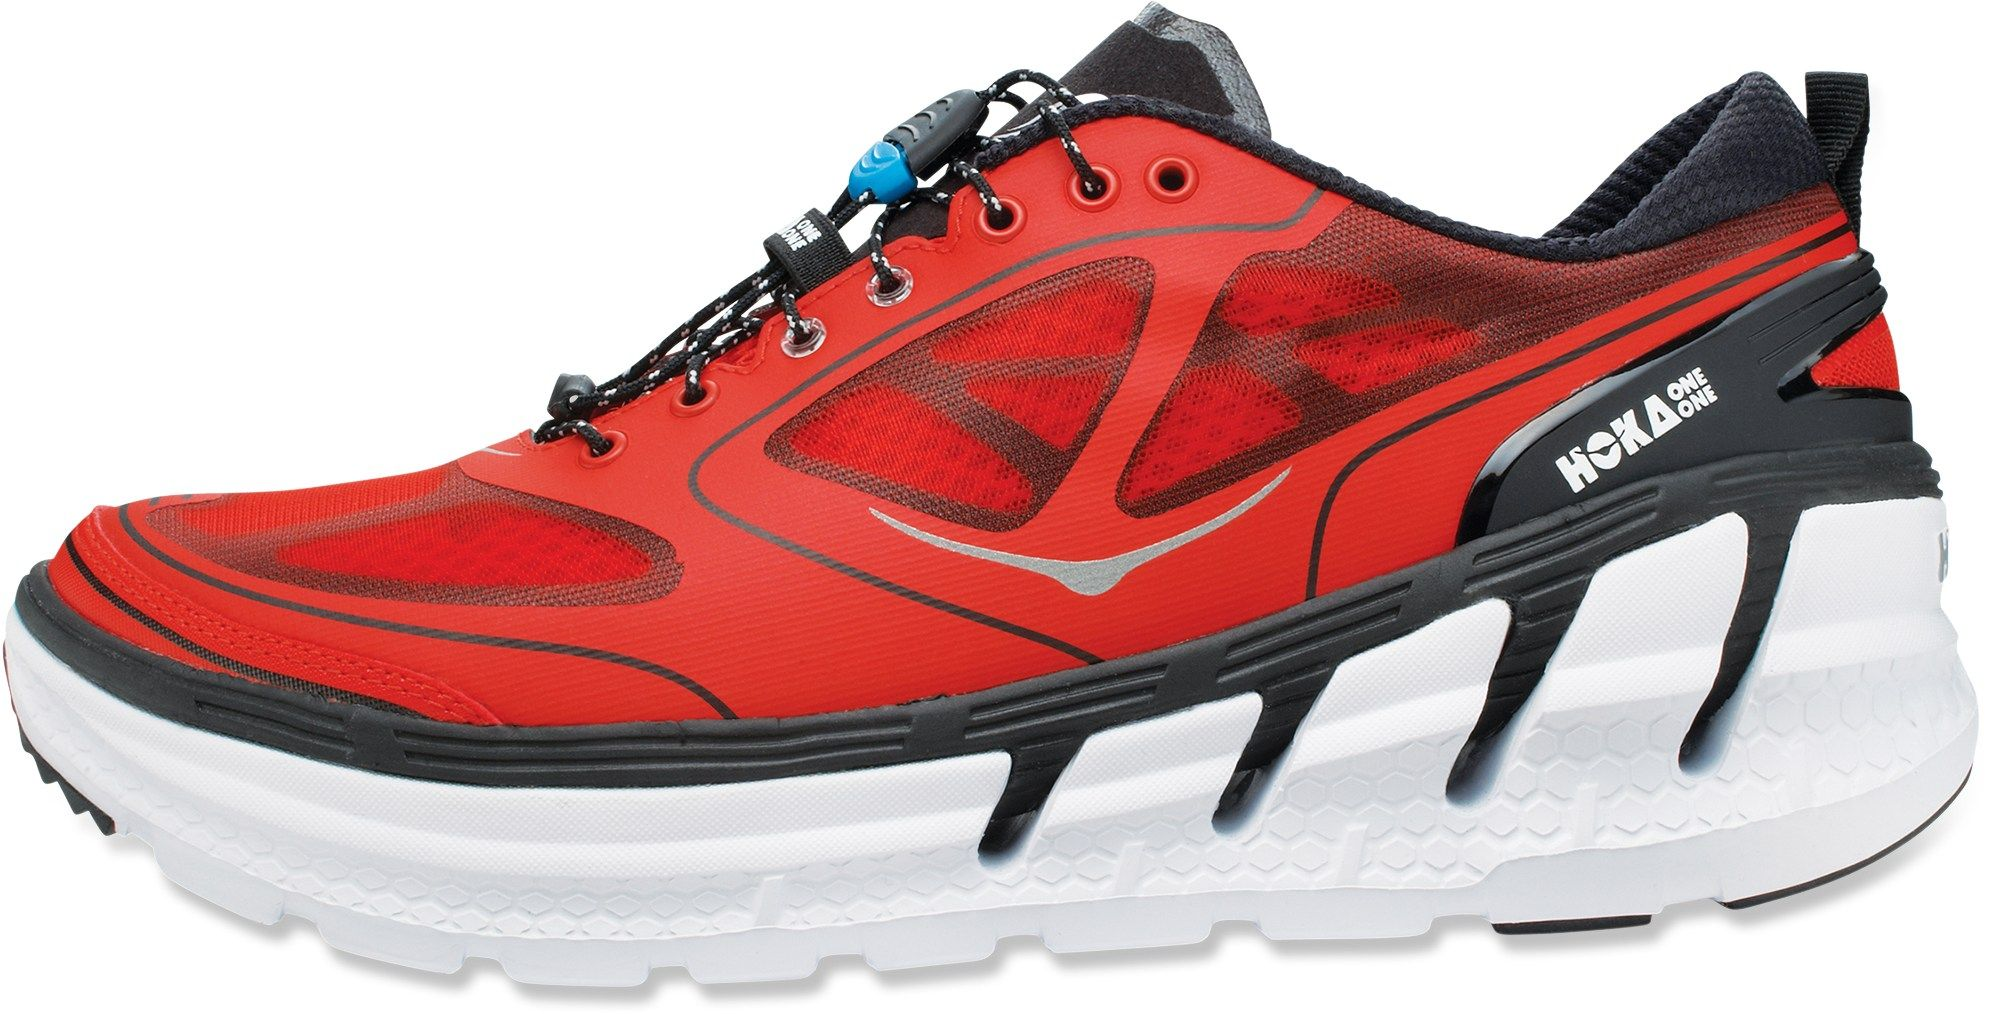 Hoka One One Conquest Road-Running Shoes - Men s - REI.com  4956ea28a41e2